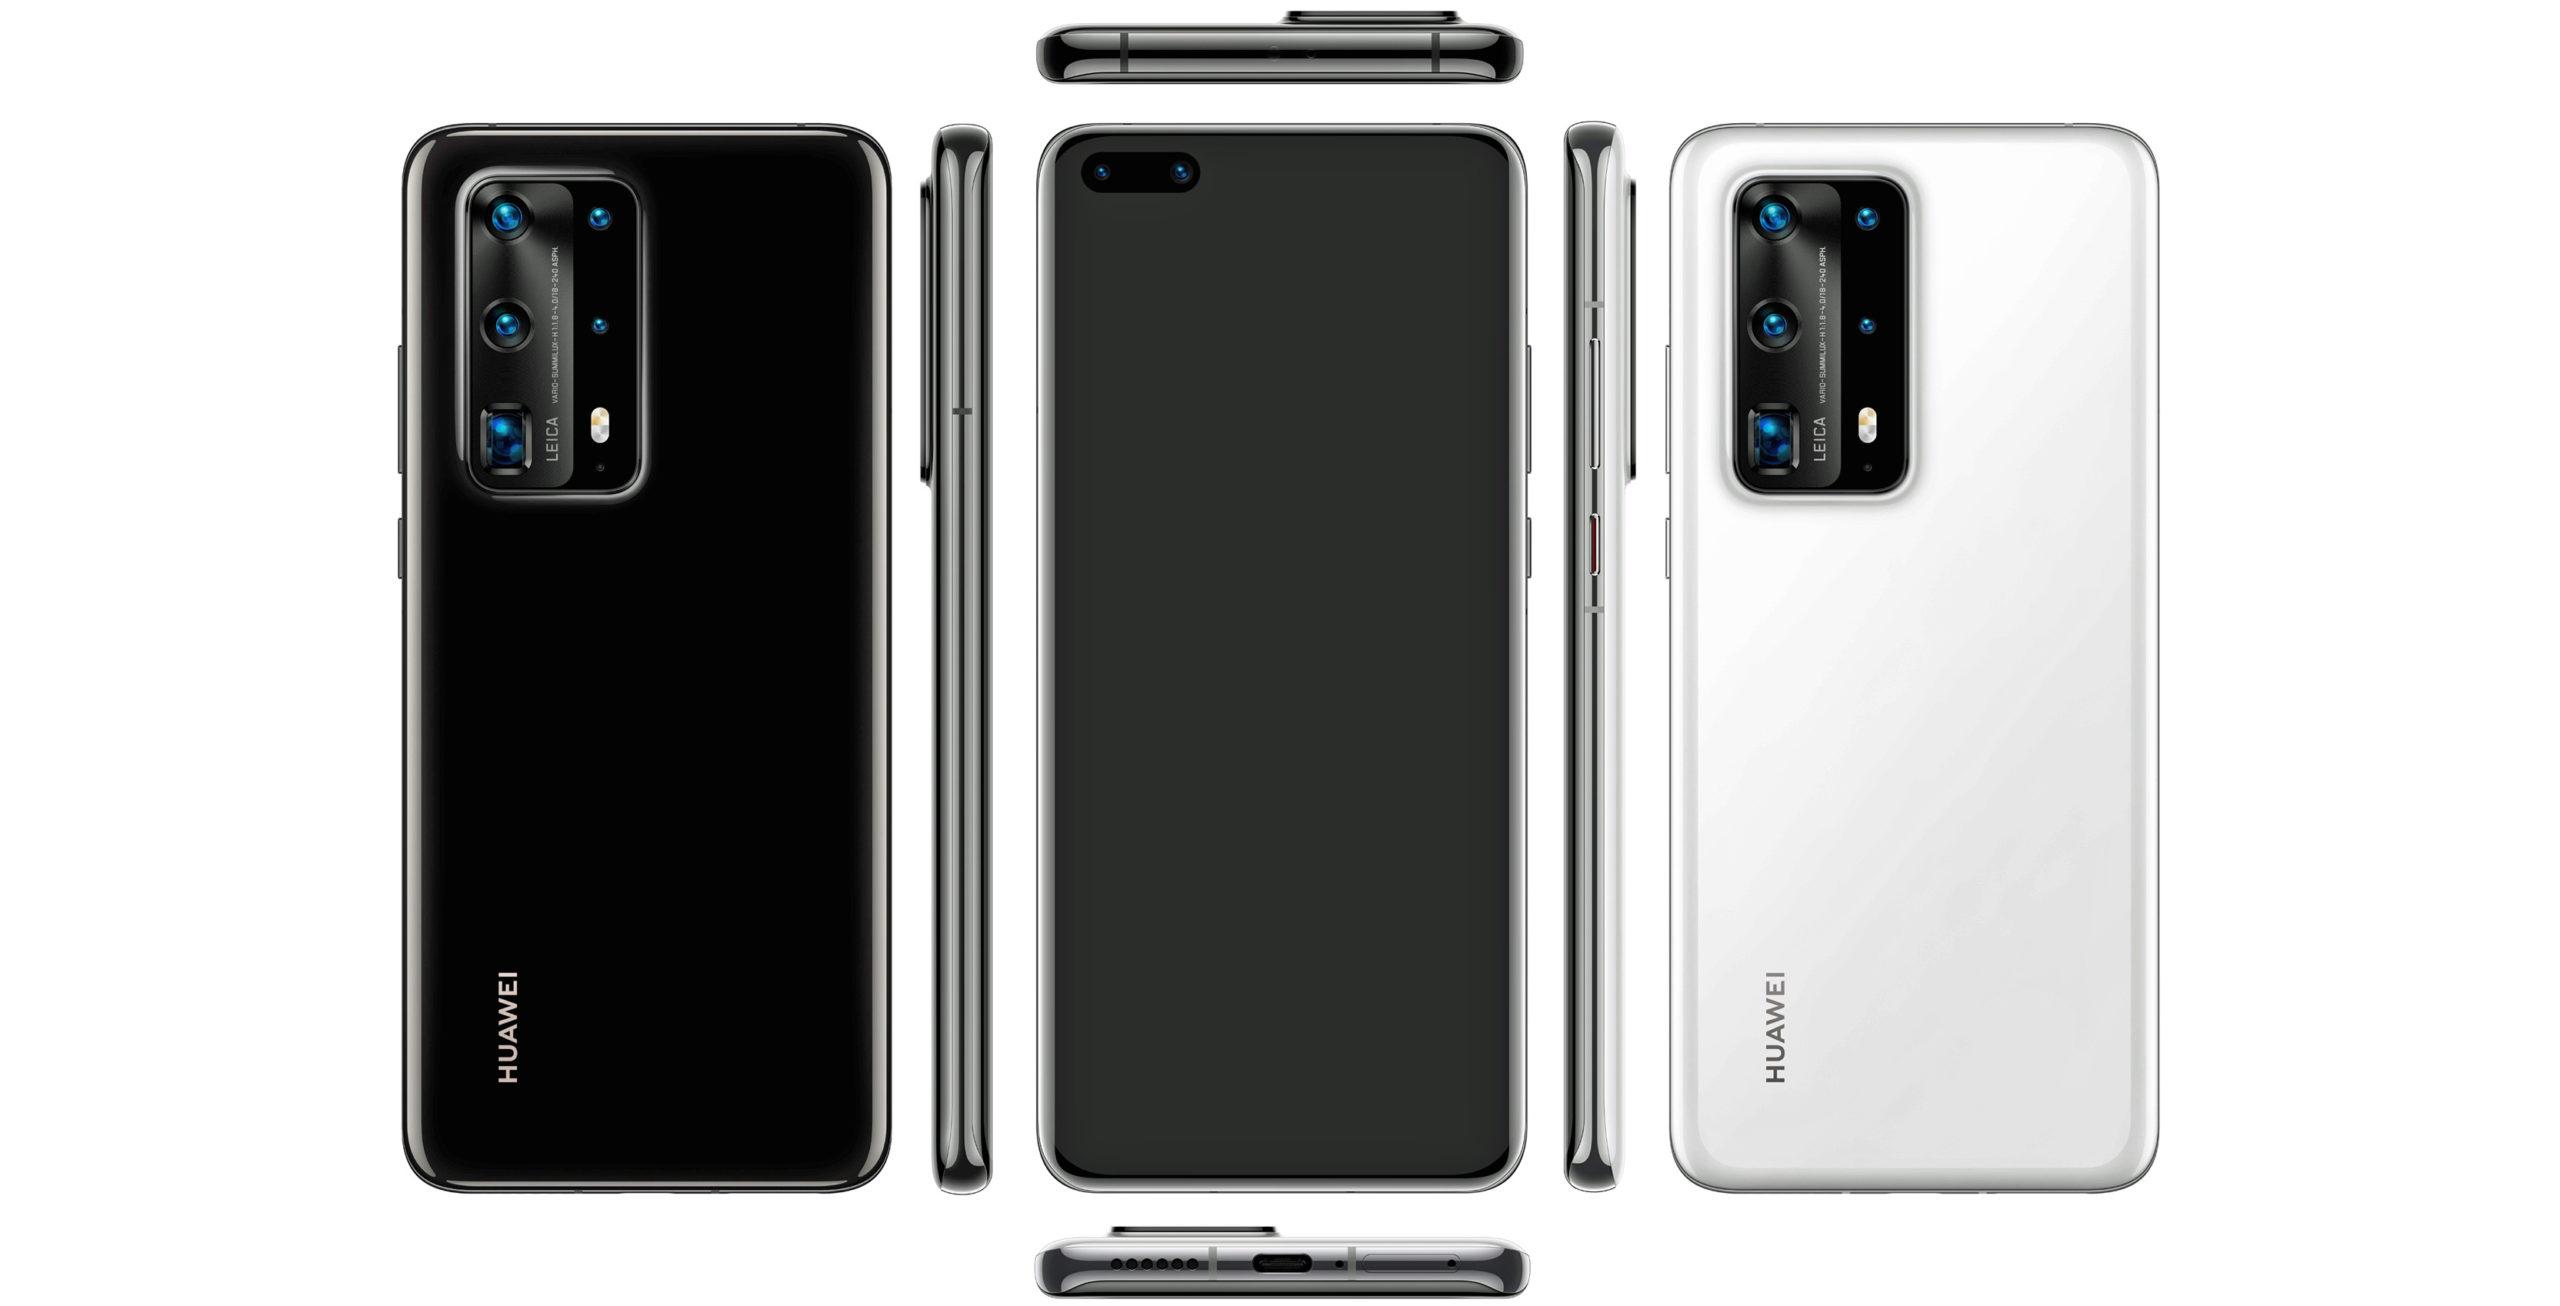 Leaked Huawei P40 Pro ceramic variant renders surface online